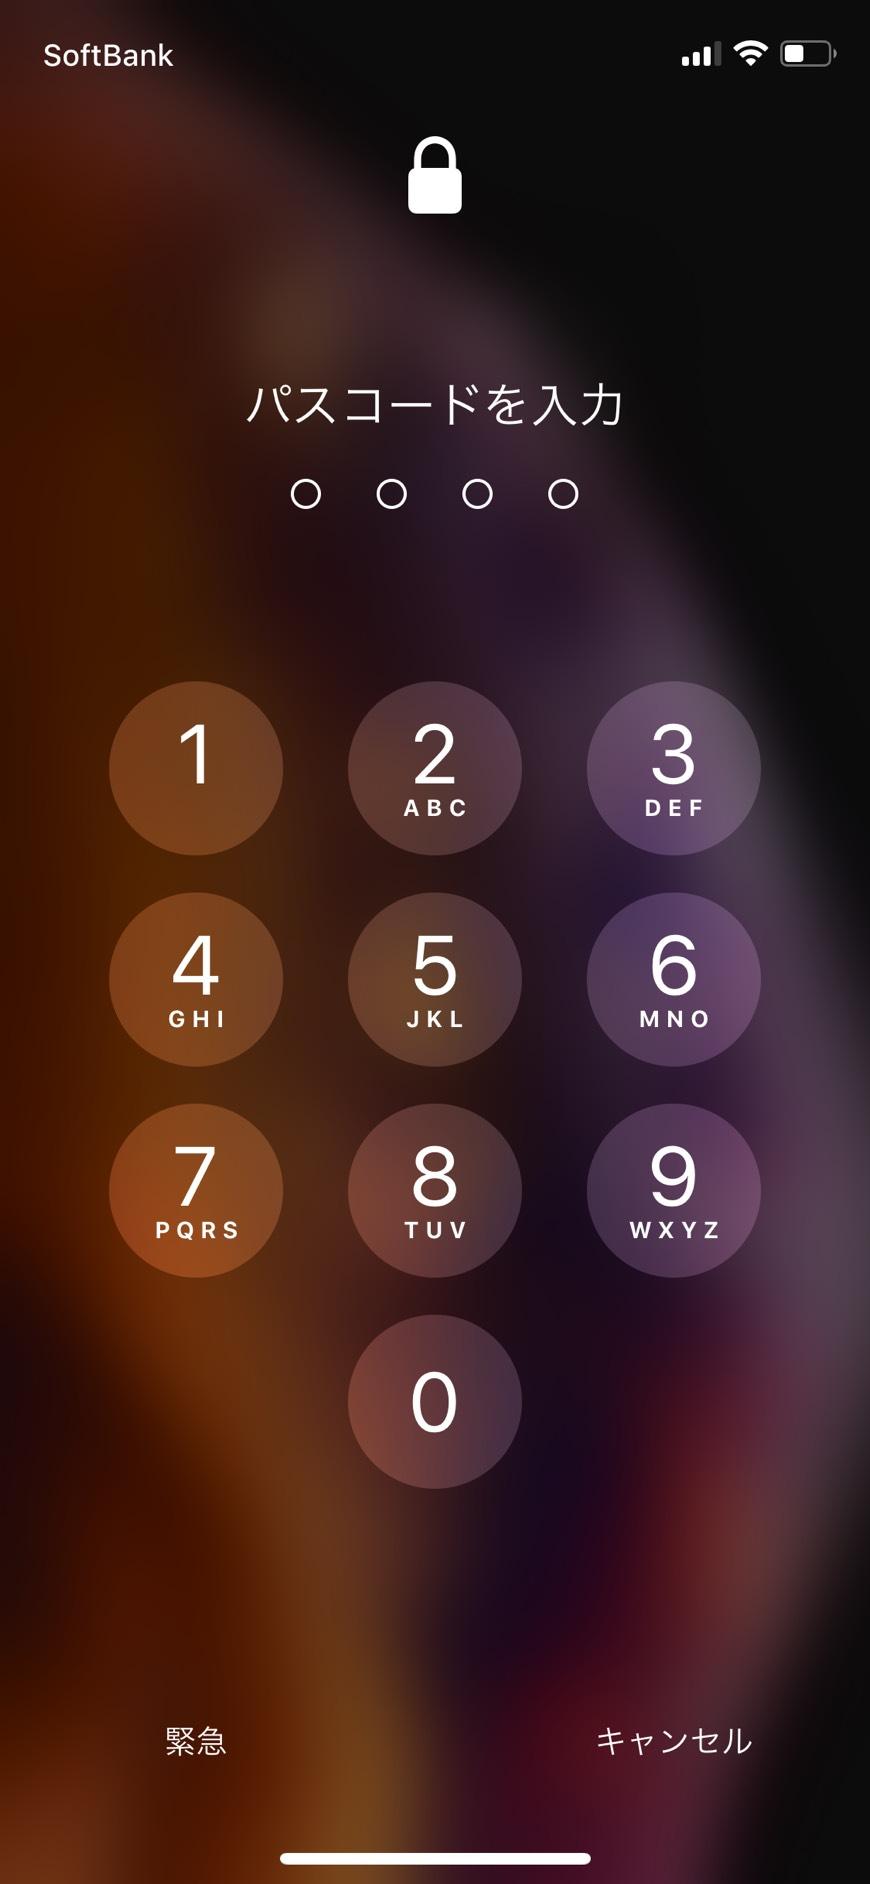 iphone パス コード 6 桁 初期 値